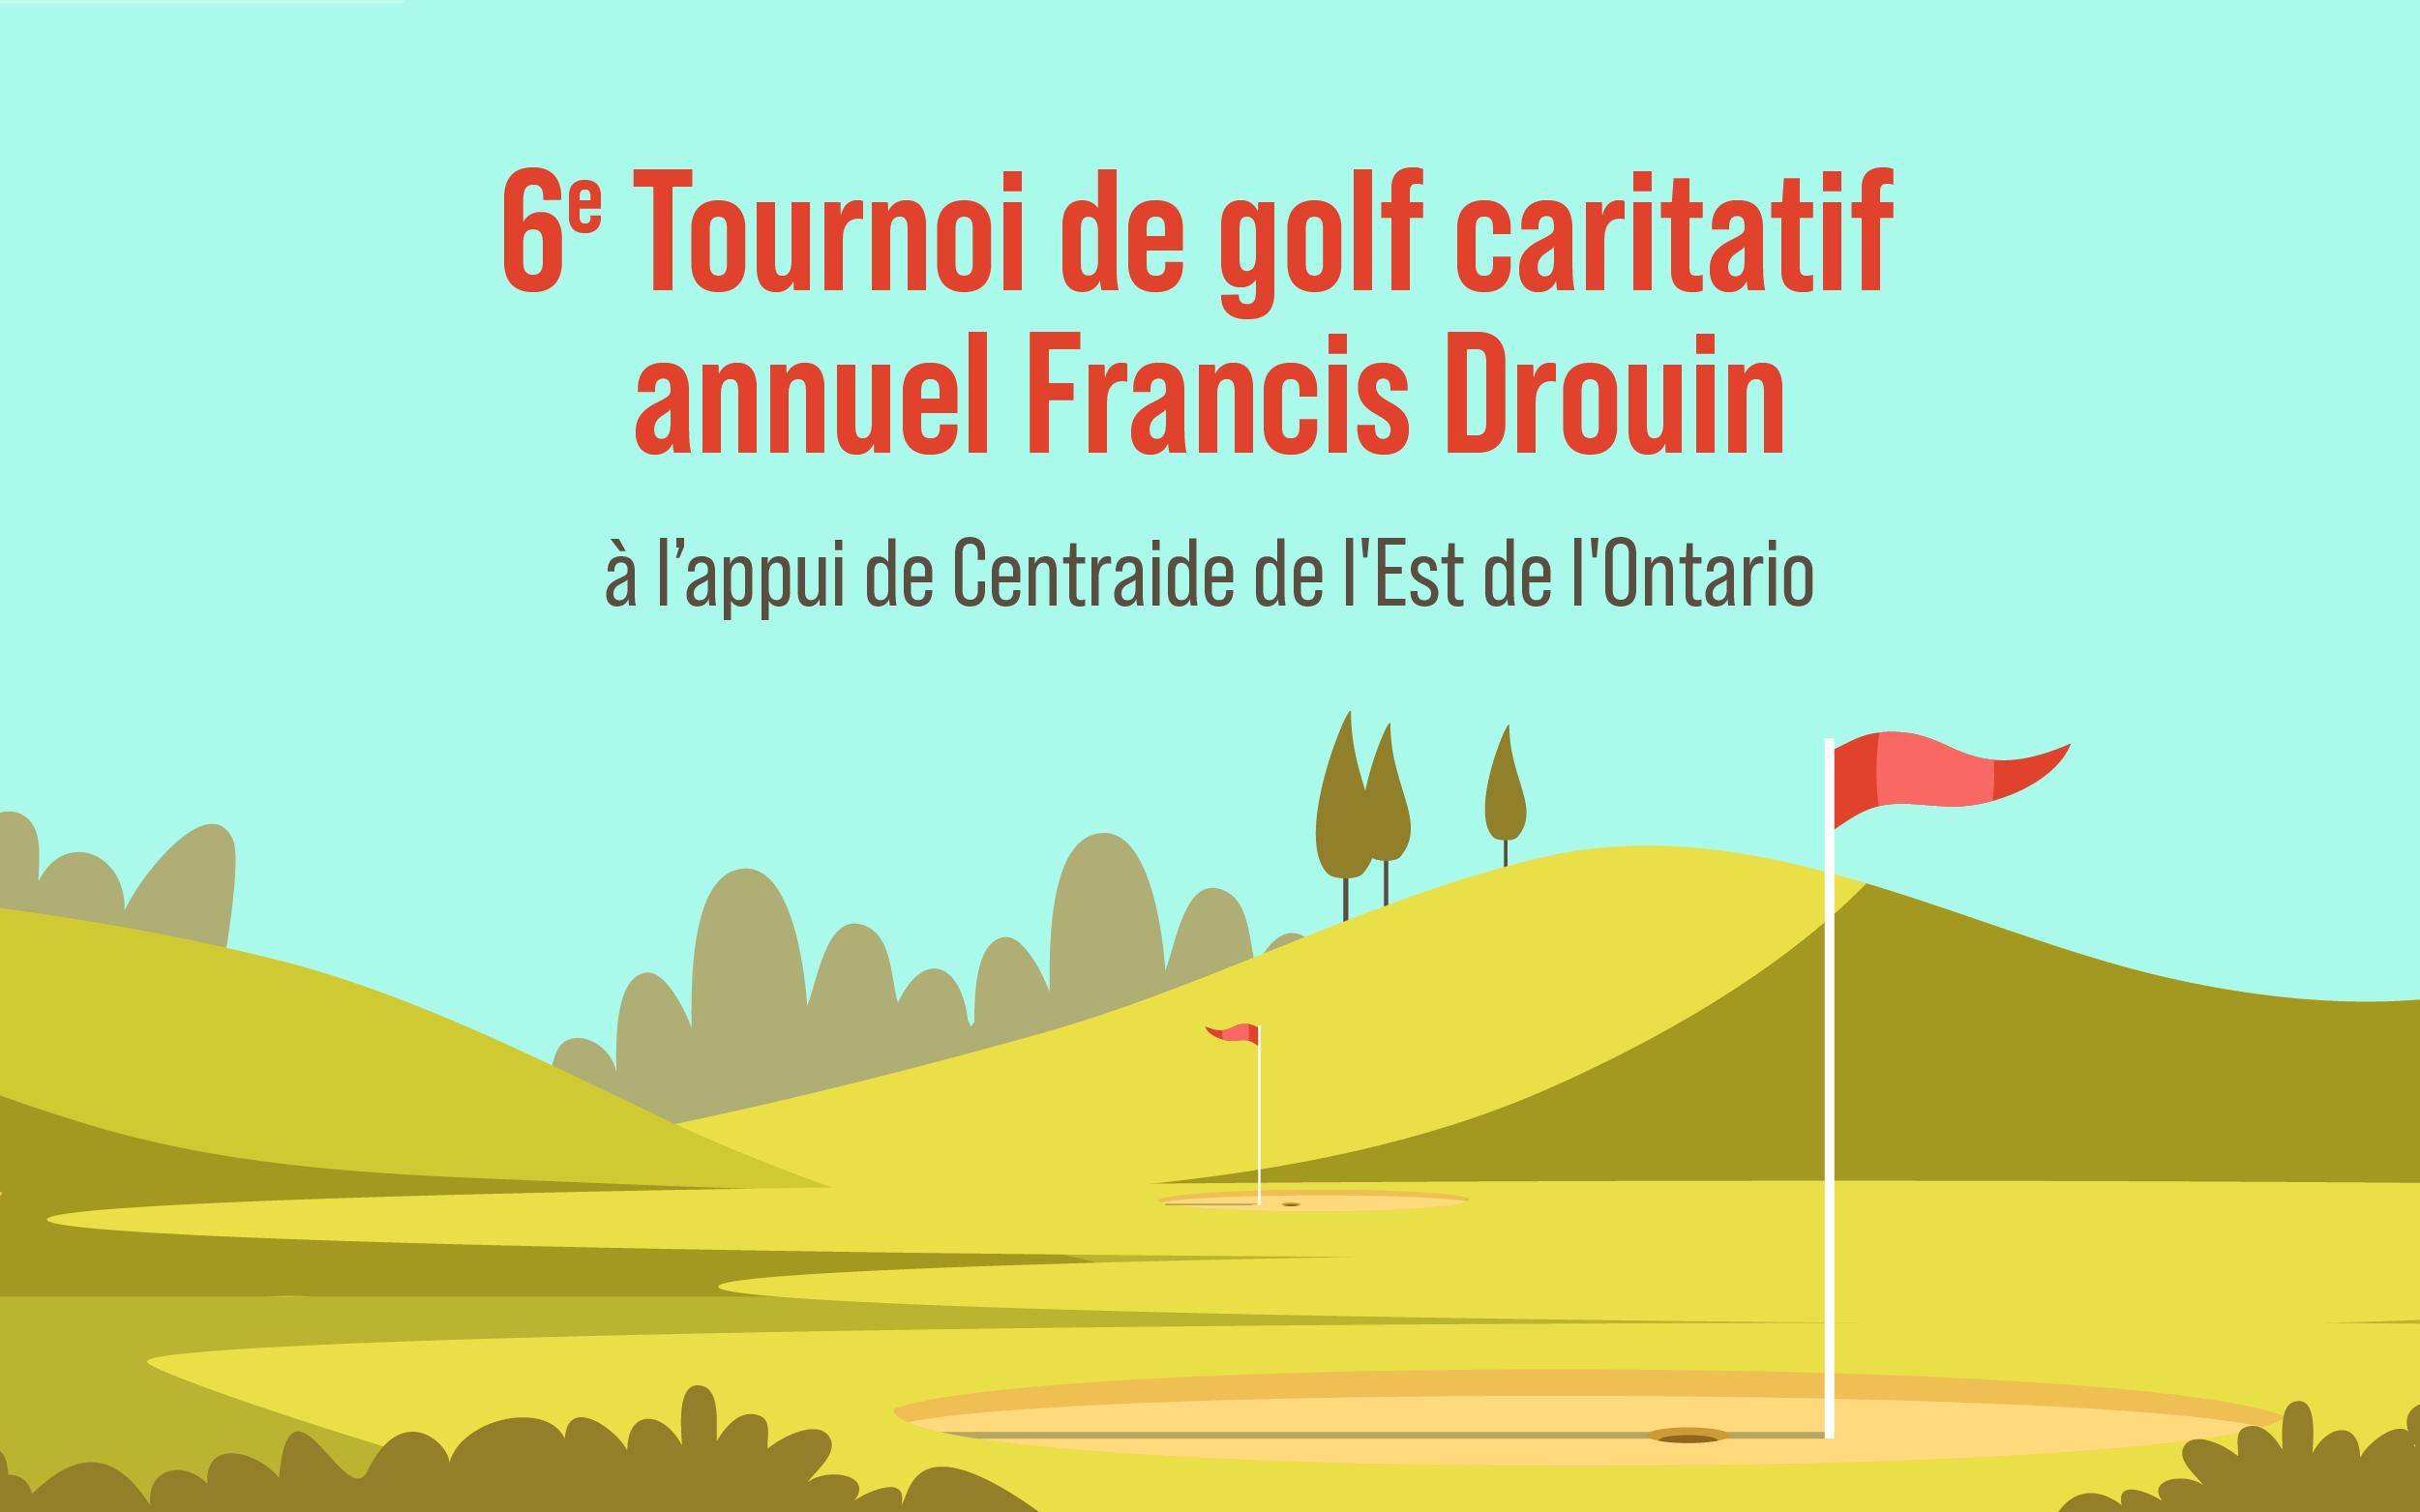 UWEO-GolfTournament_THUMB-FR